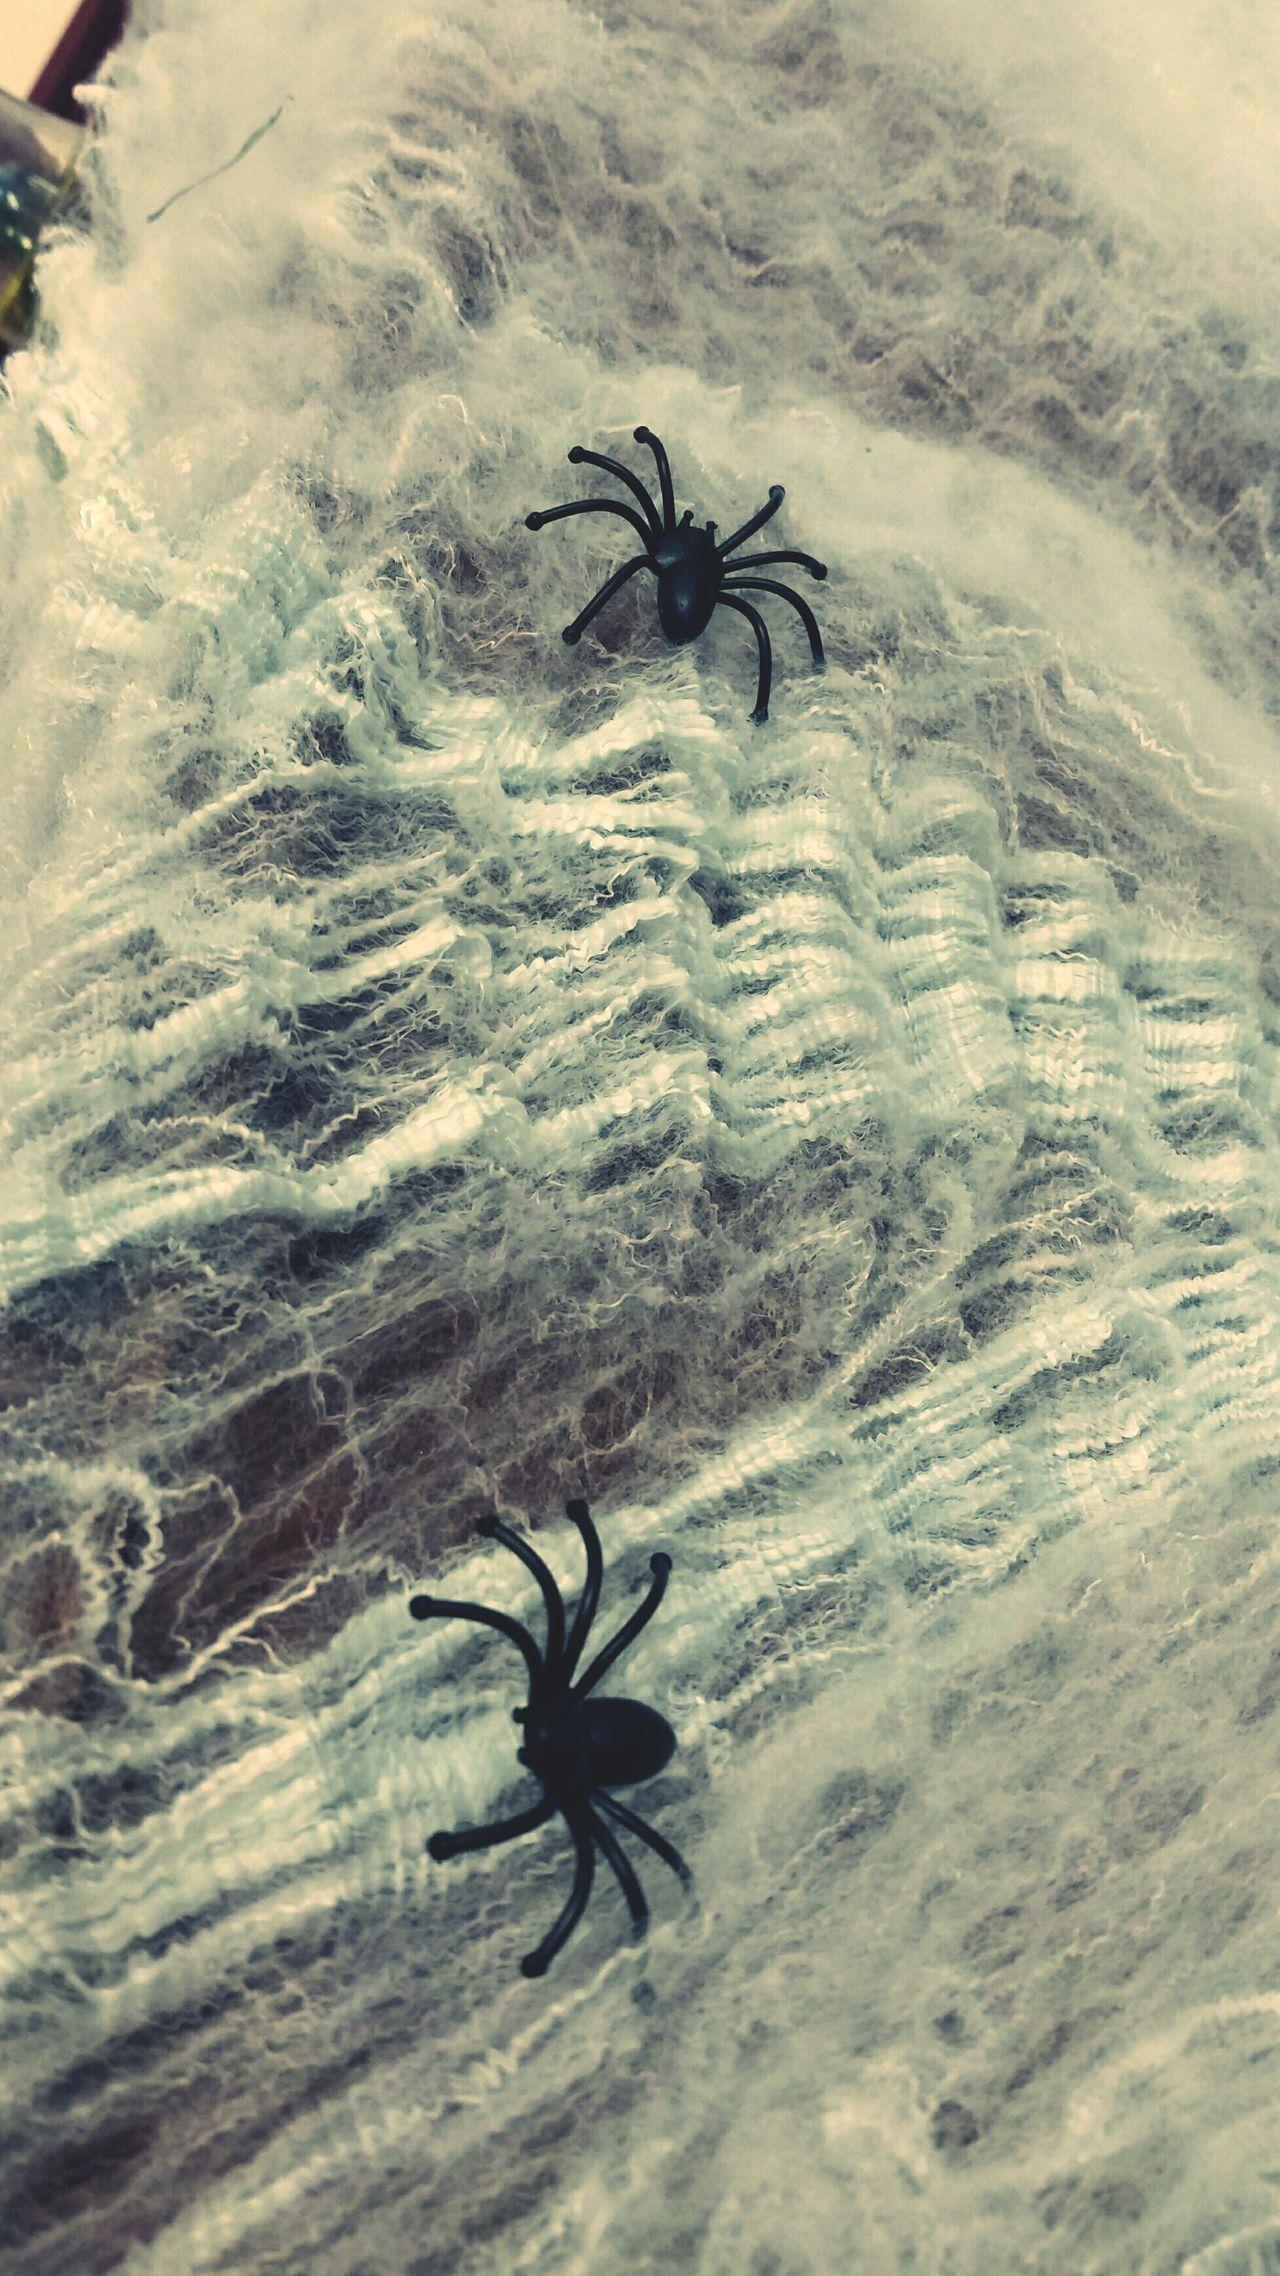 SpookyHalloween is coming Spidersweb EyeEm Gallery Capture The Moment Spiders Happy Halloween! 🎃